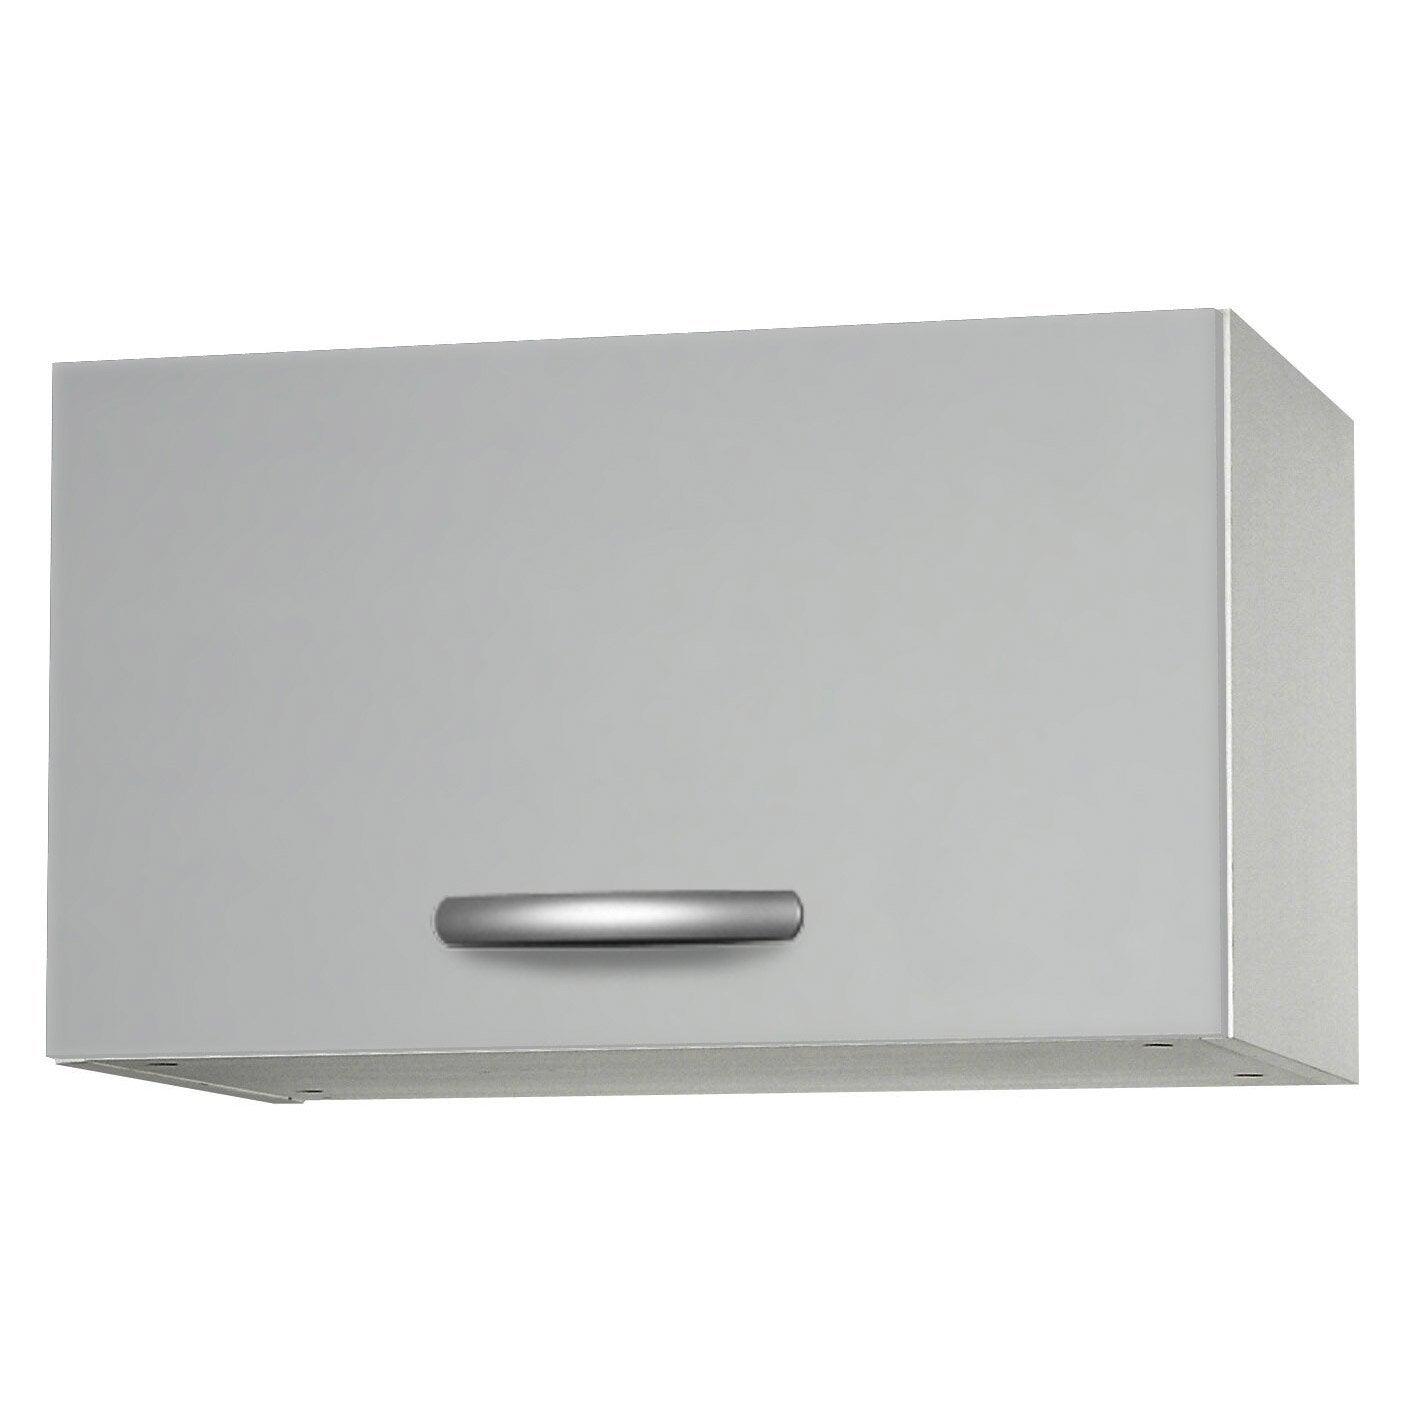 Meuble de cuisine haut 1 porte gris aluminium for Porte 60 x 50